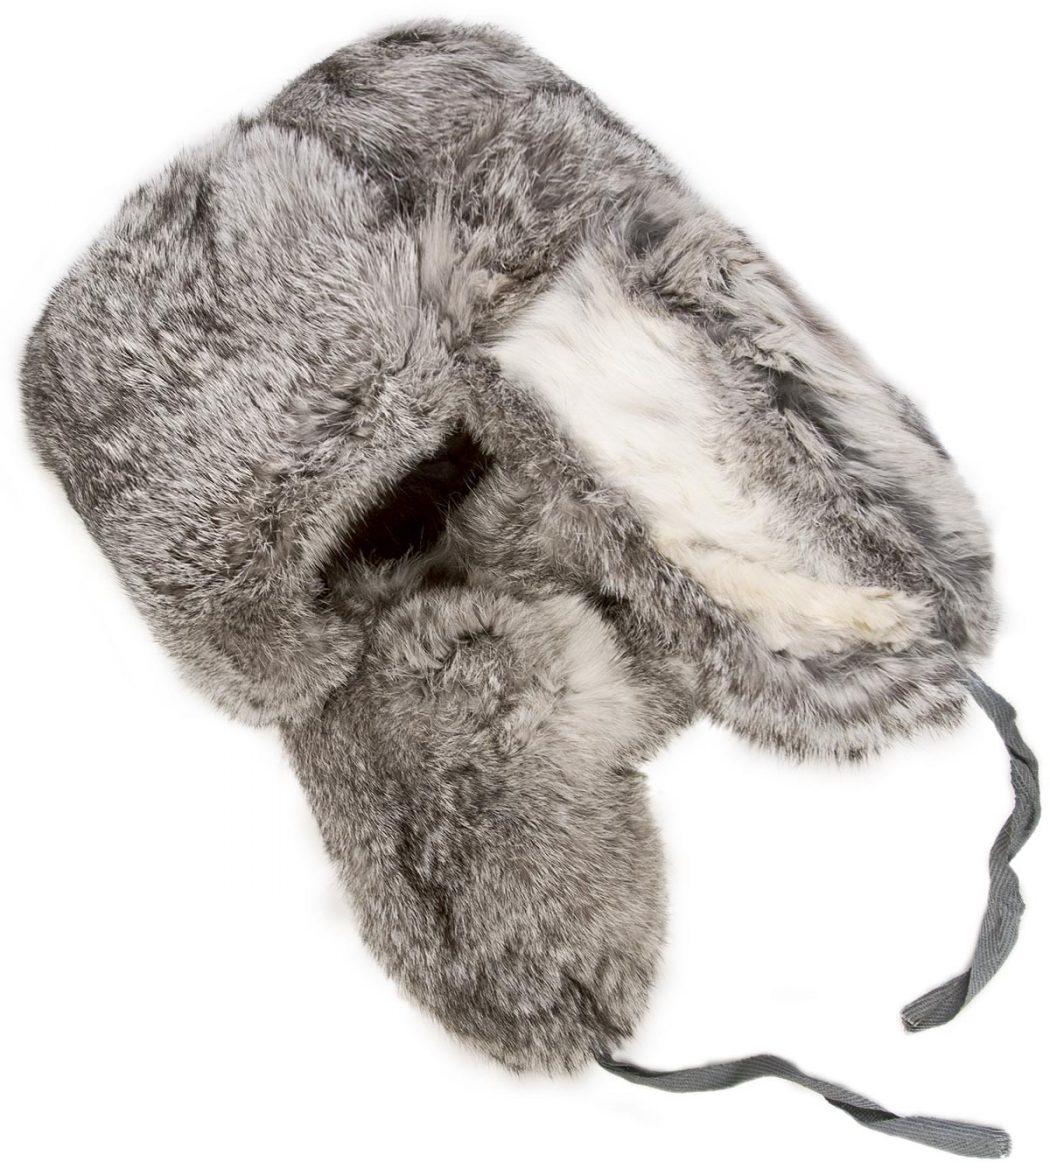 rabbit-fur-hat Best 10 Ideas for Choosing Winter Gifts